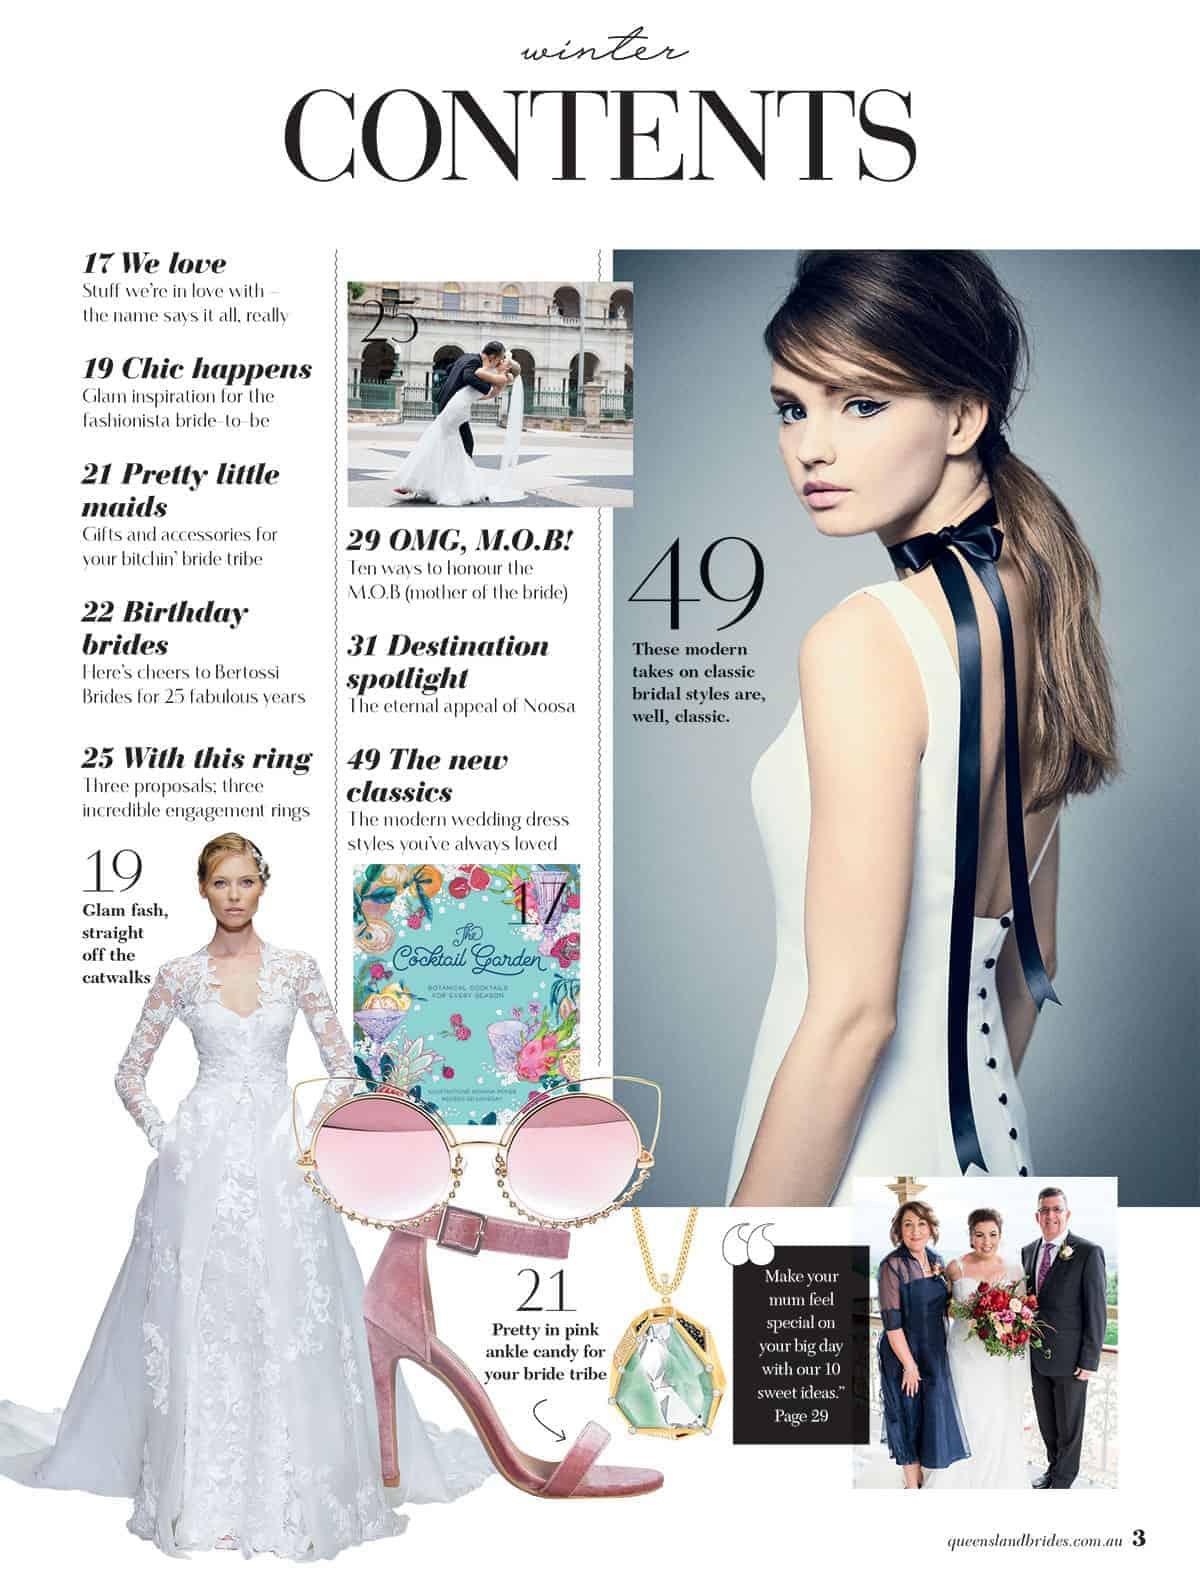 Queensland Brides Winter 2017 contents